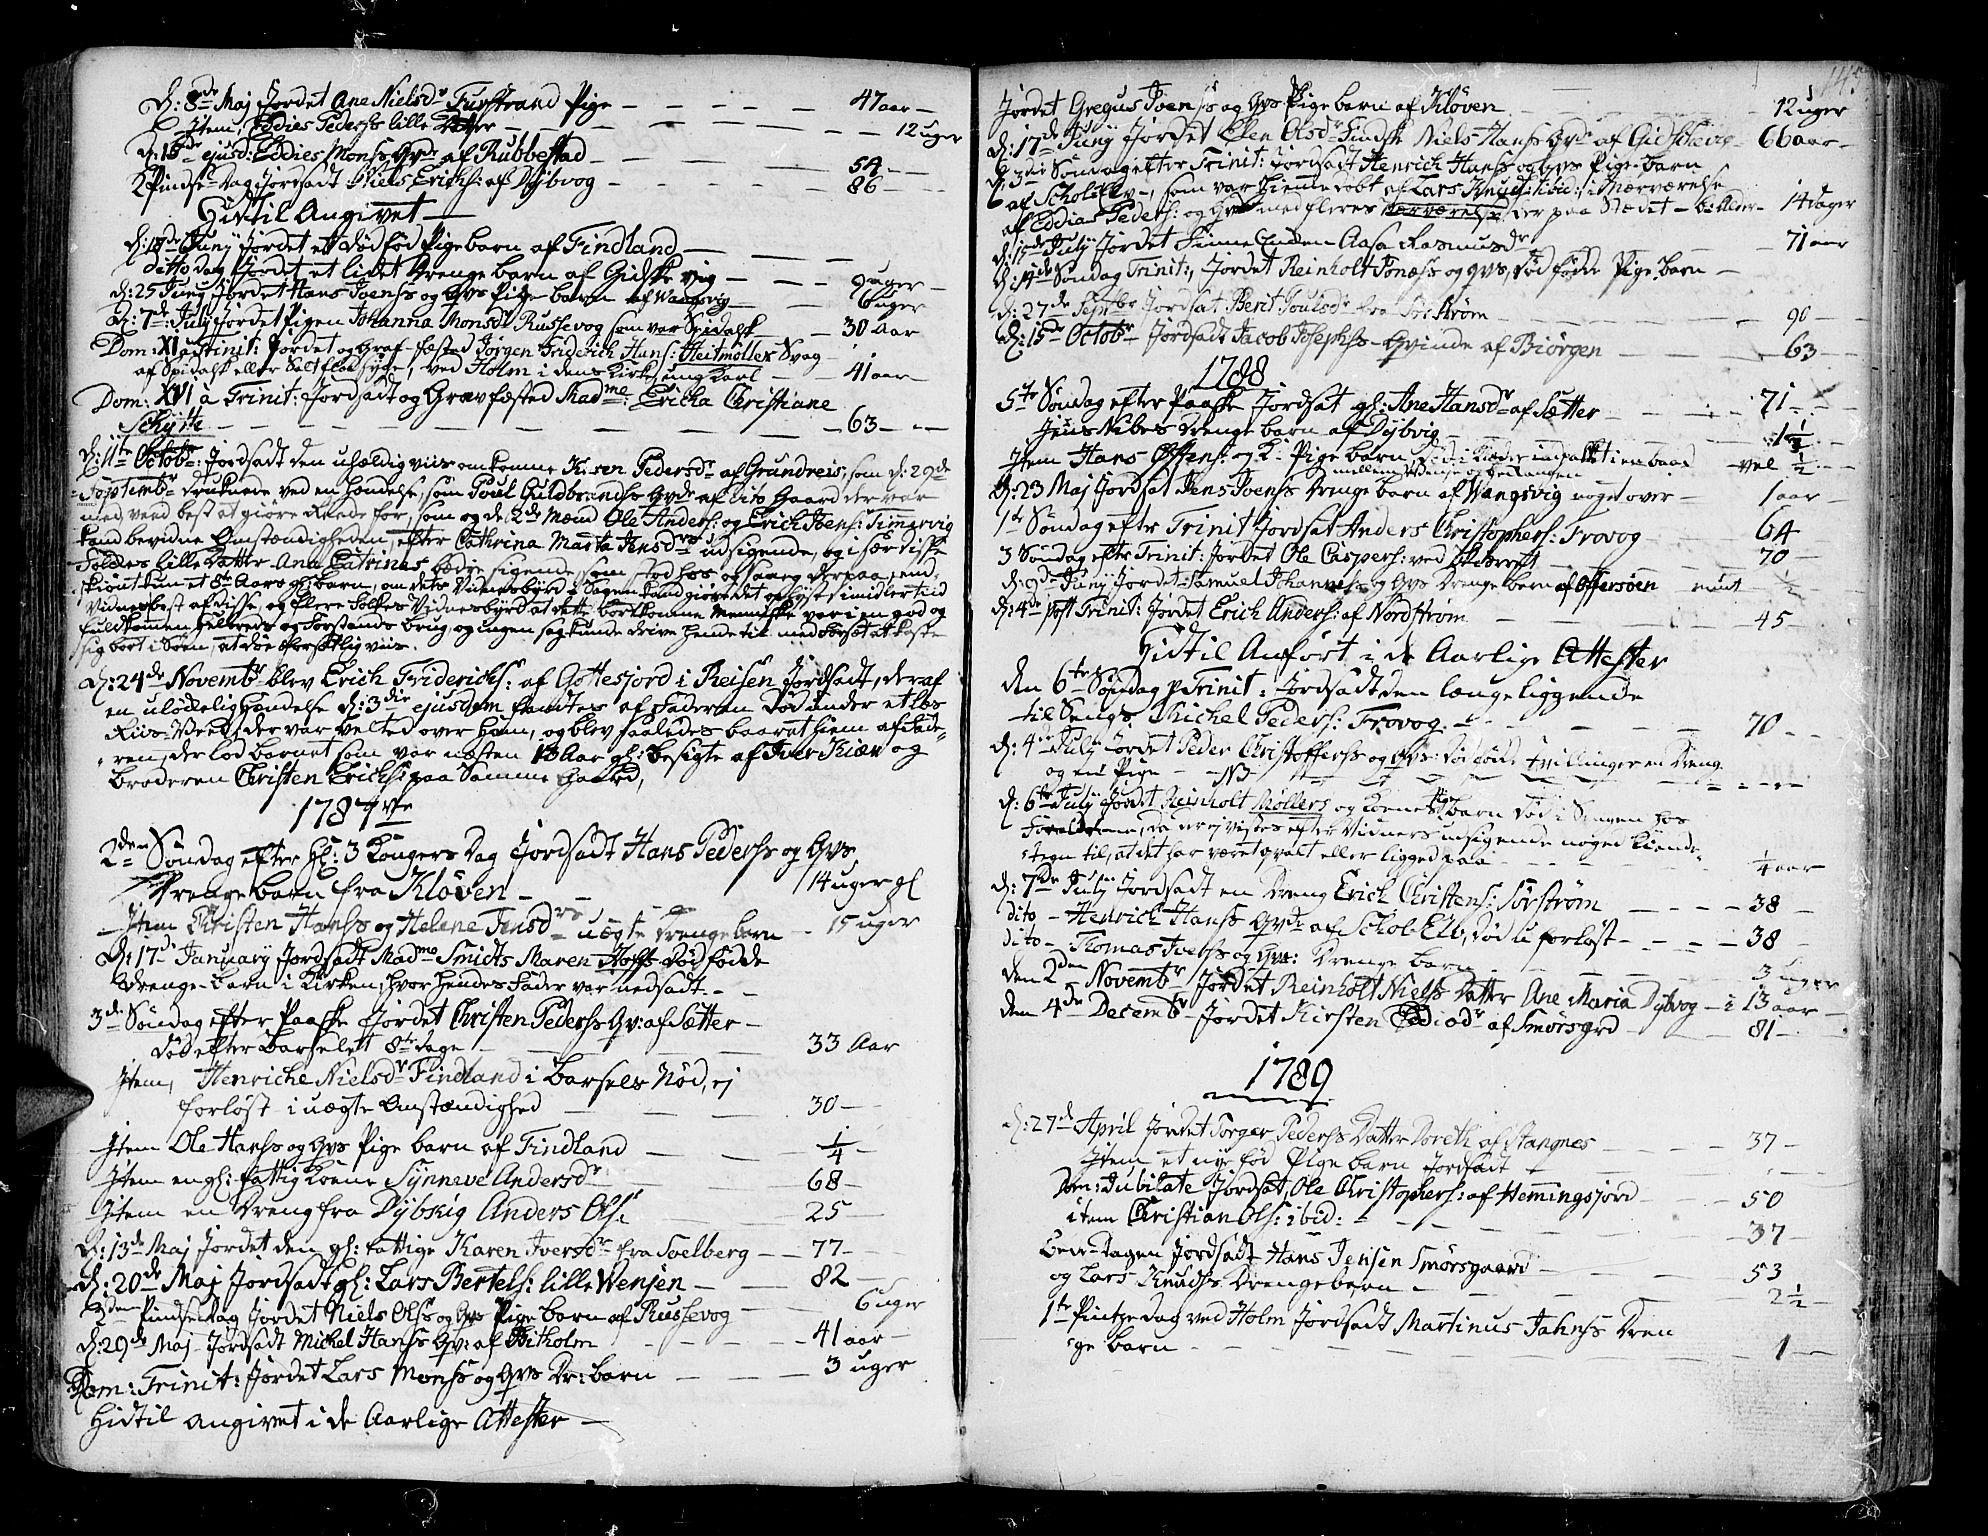 SATØ, Tranøy sokneprestkontor, I/Ia/Iaa/L0002kirke: Ministerialbok nr. 2, 1773-1806, s. 145